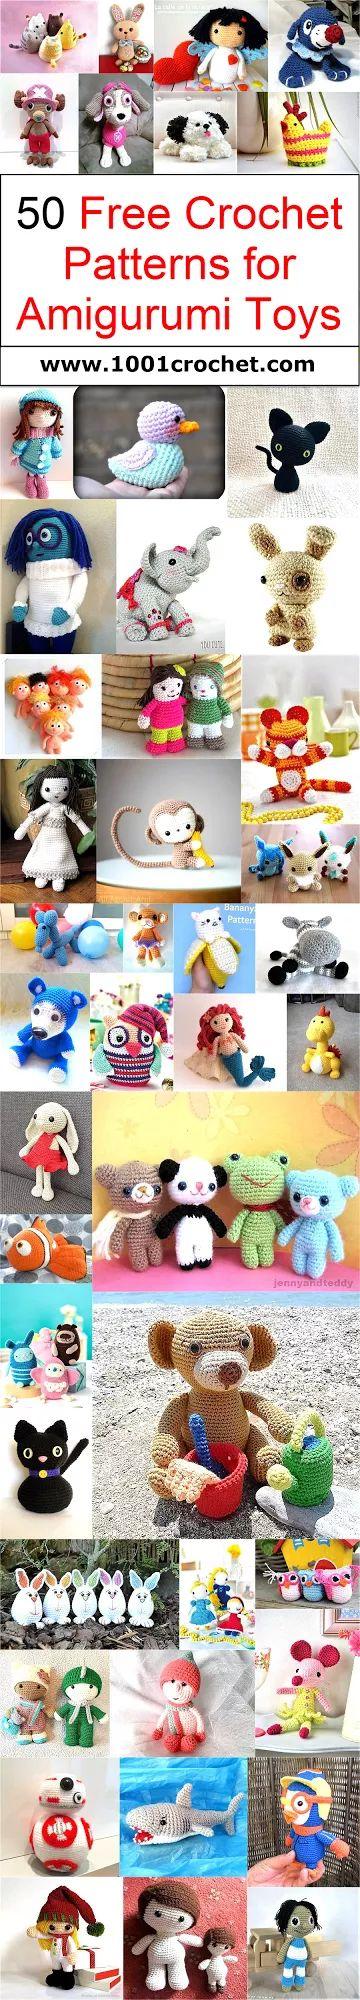 50-free-crochet-patterns-for-amigurumi-toys